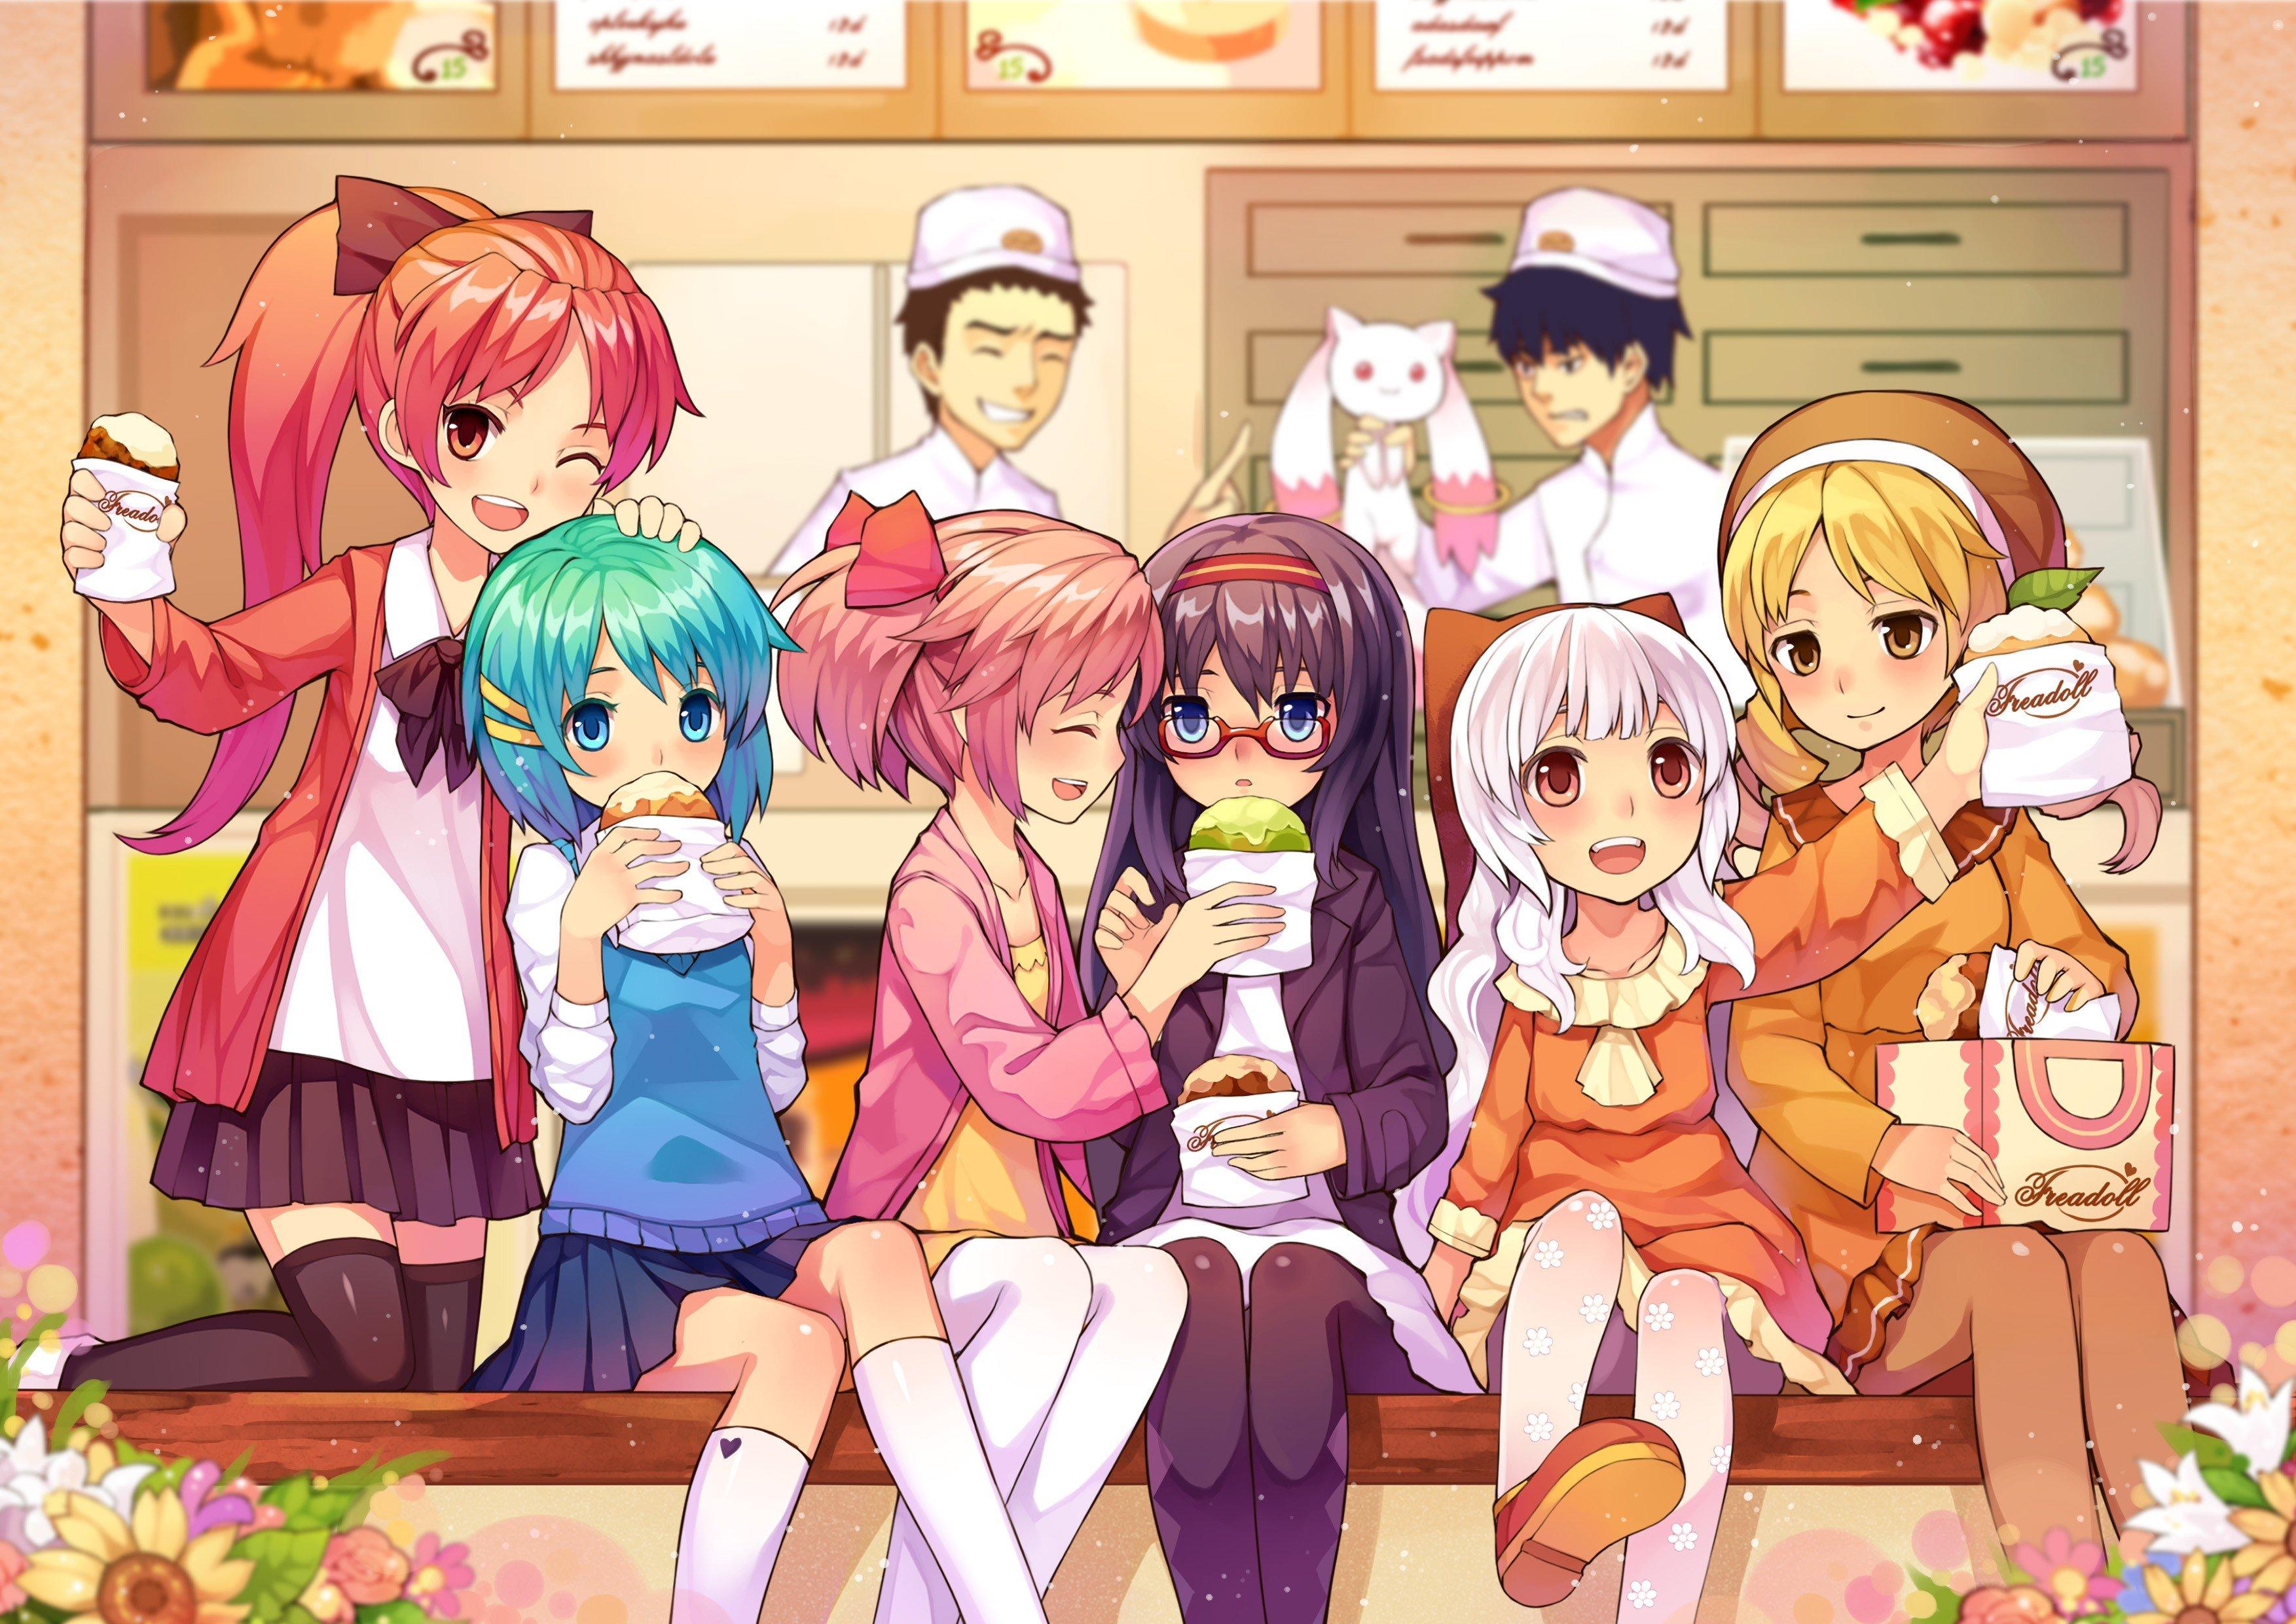 anime, Anime girls, Mahou Shoujo Madoka Magica, Kaname Madoka, Akemi Homura, Tomoe Mami, Miki Sayaka, Momoe Nagisa, Sakura Kyouko Wallpaper